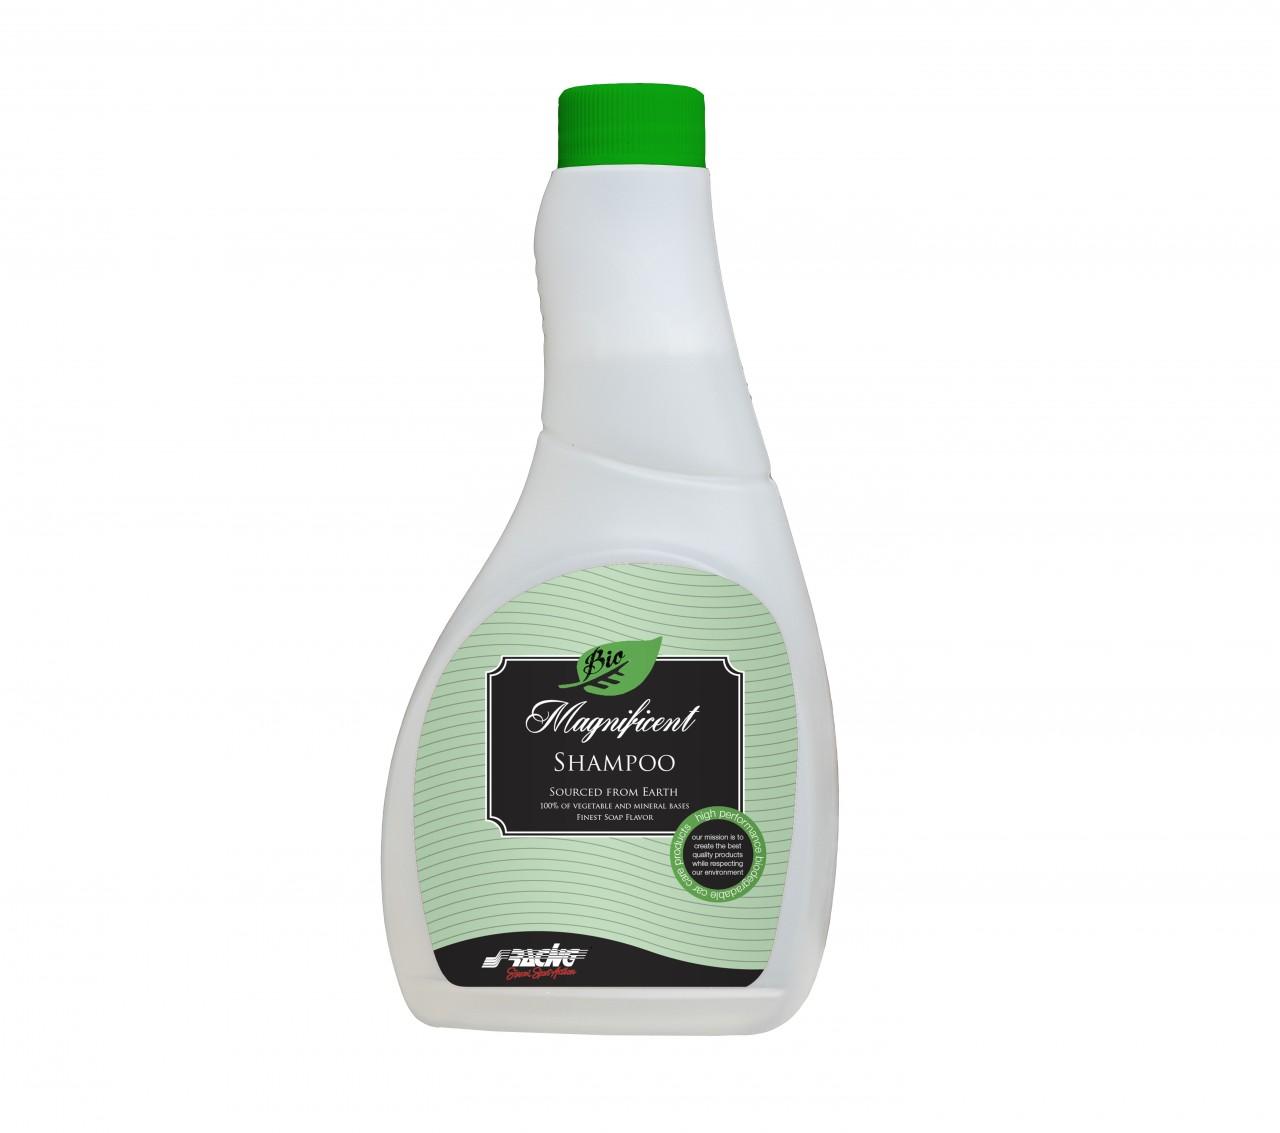 Detergenti-pulizia-auto-Simoni-Racing